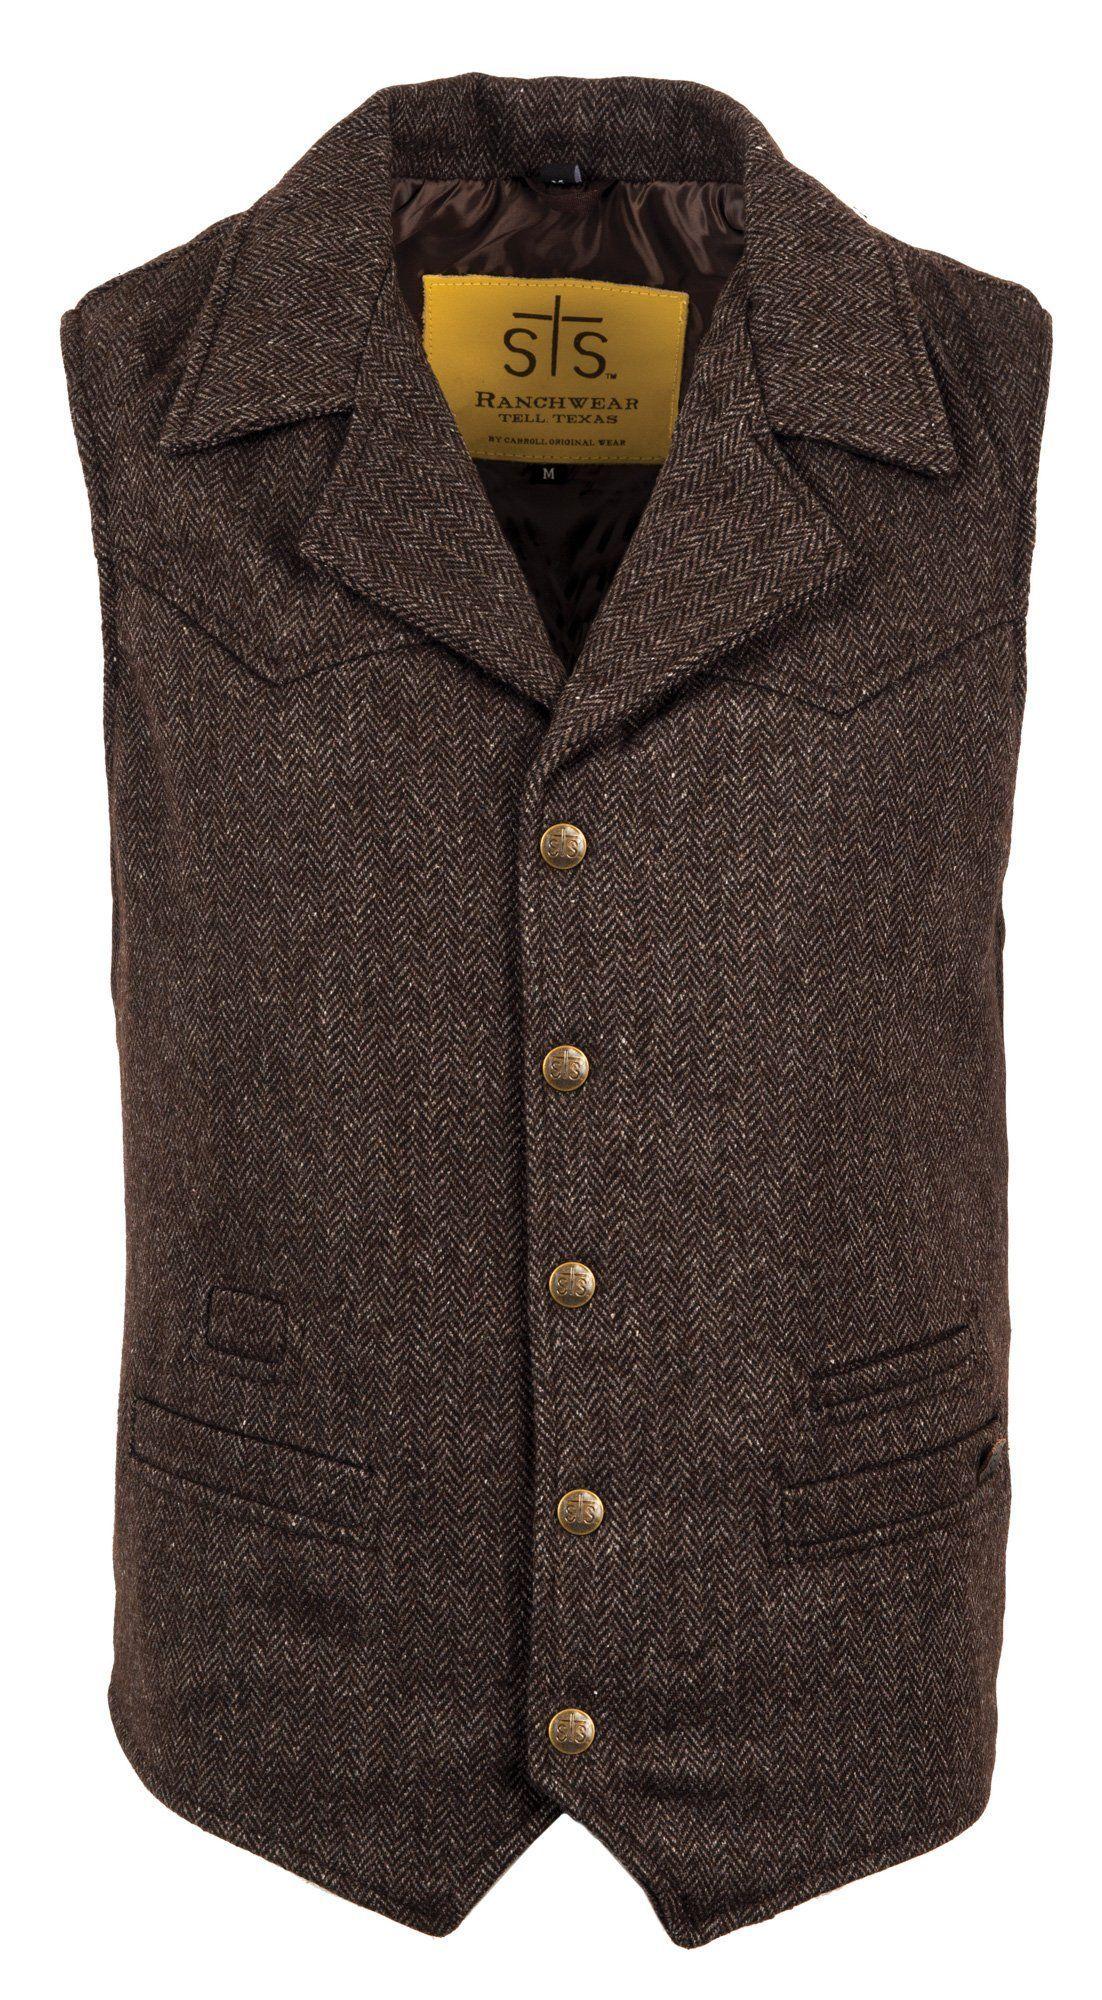 Sts Ranchwear Mens Gambler Wool Vest Chocolate Western The Western Company Mens Vest Fashion Vest Outfits Men Mens Wool Vest [ 2000 x 1102 Pixel ]